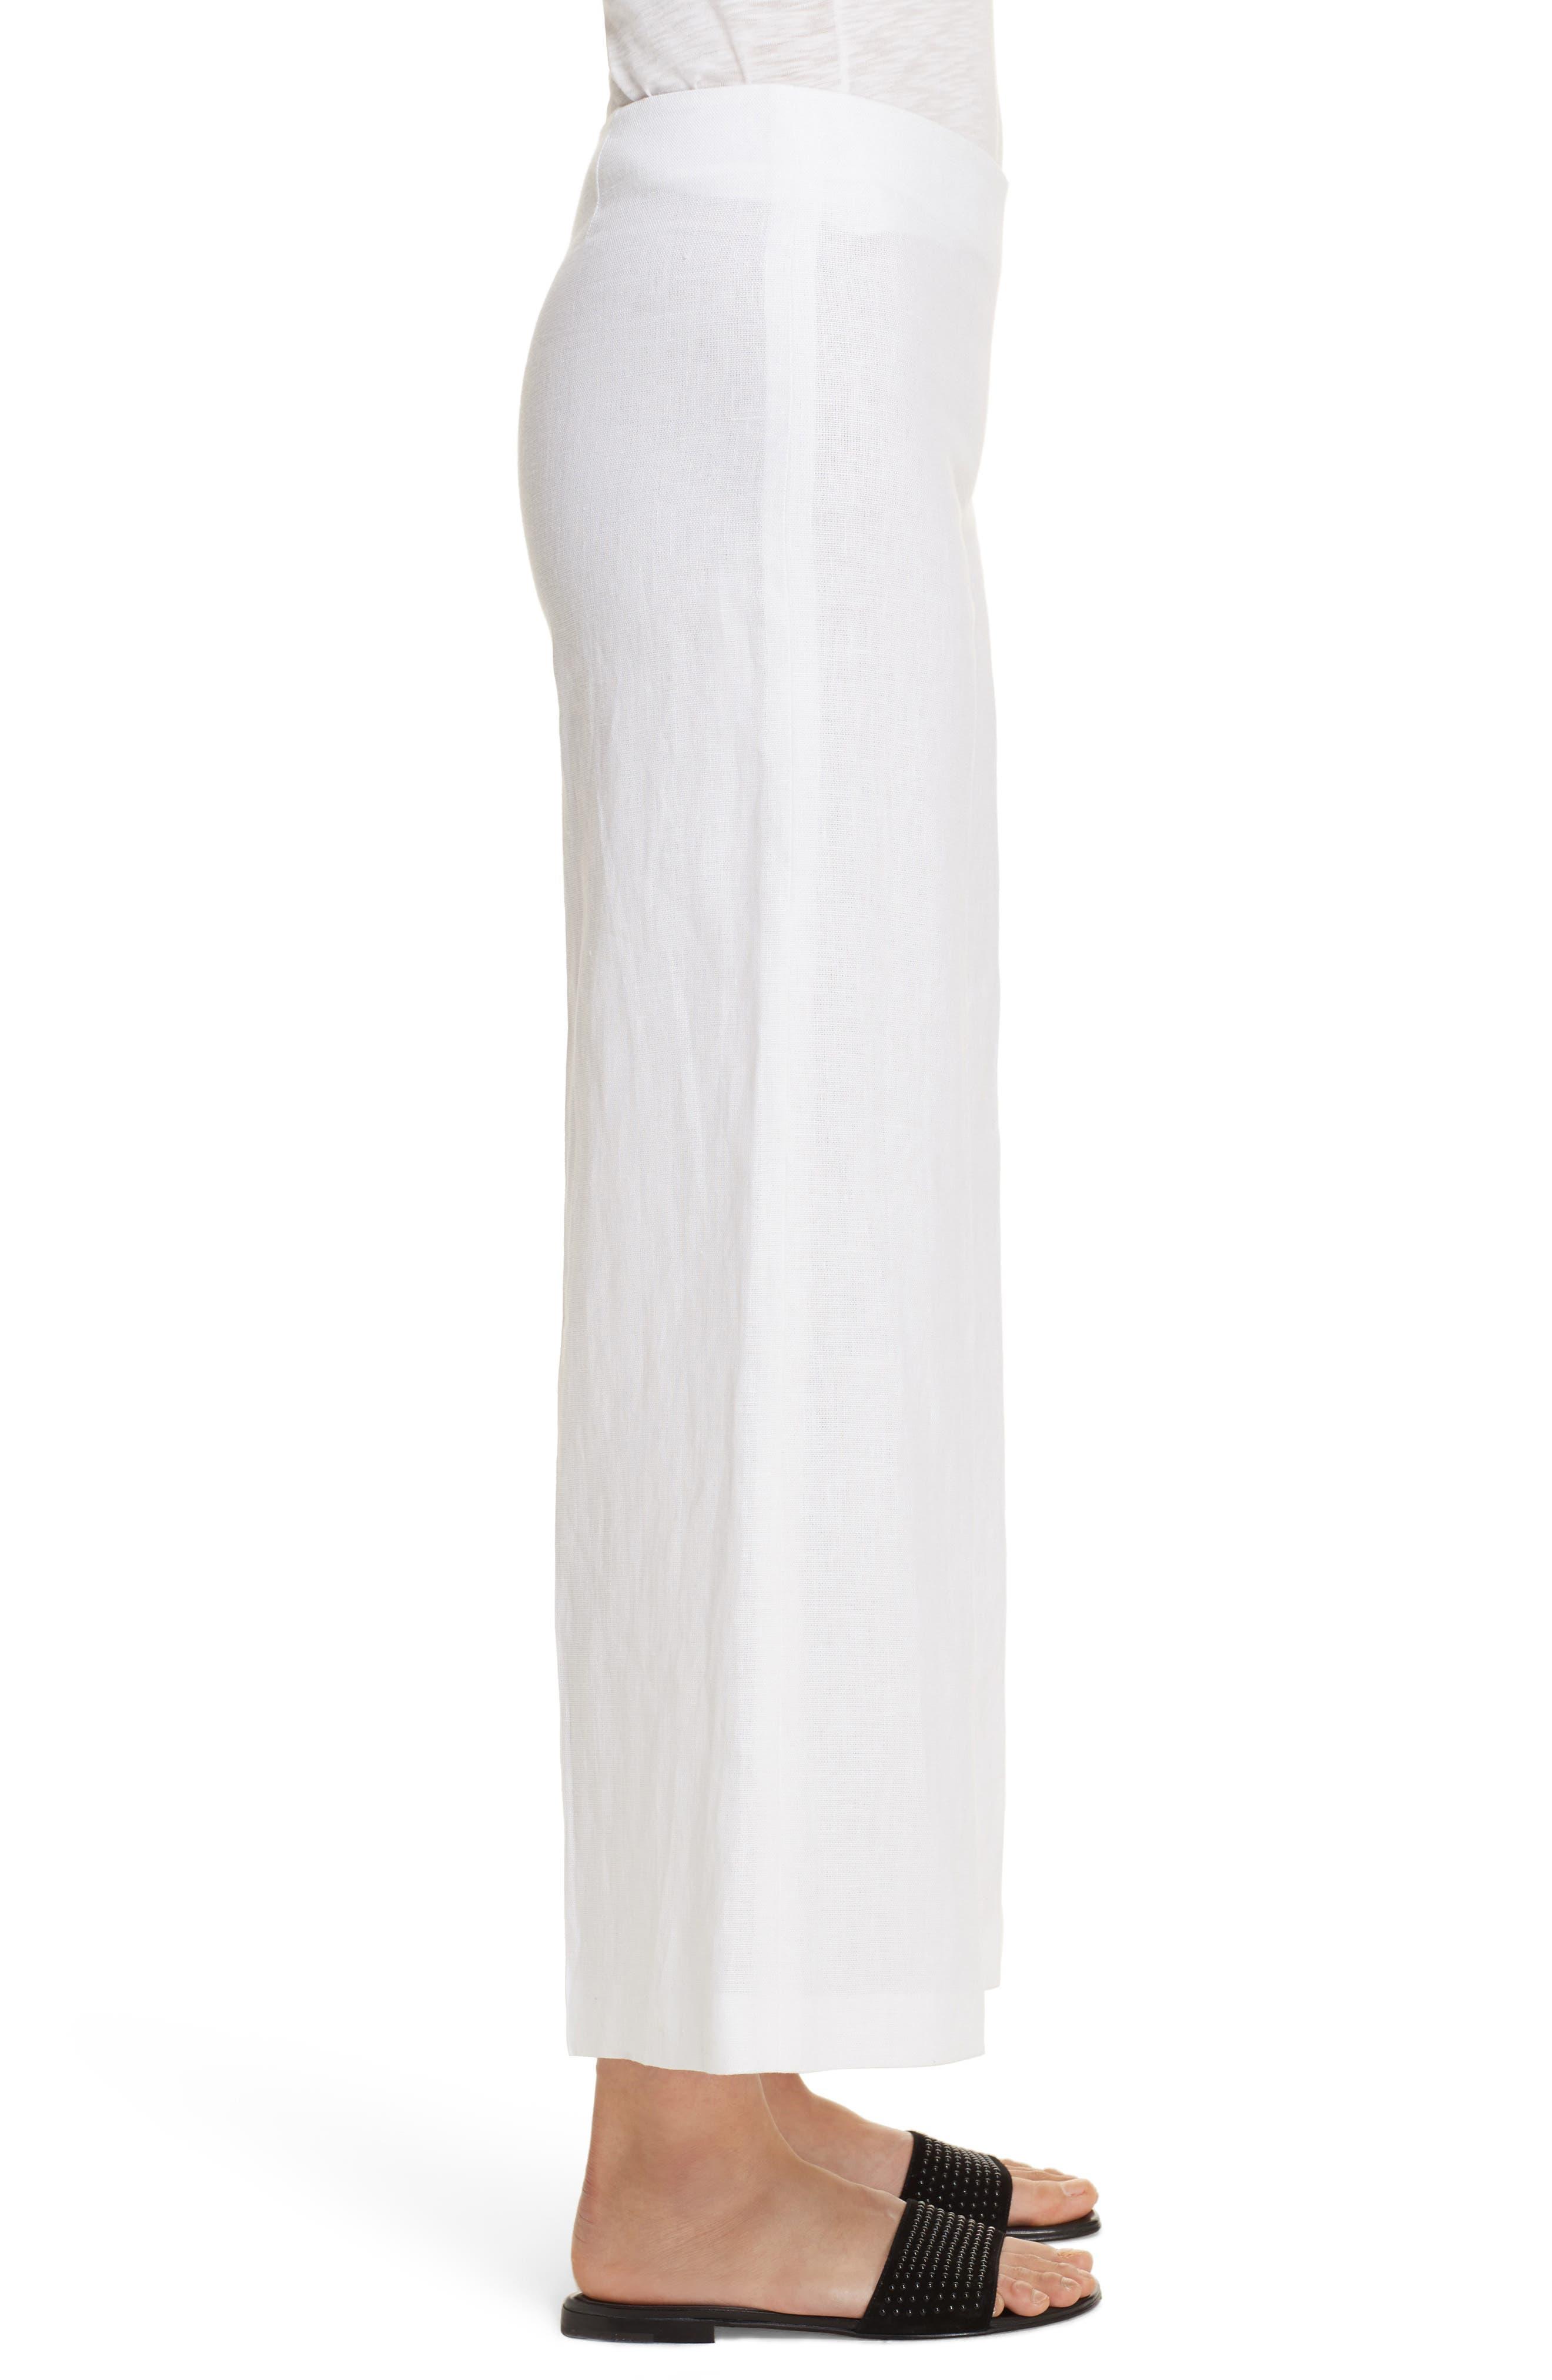 Terena B Linen Wide Leg Pants,                             Alternate thumbnail 3, color,                             White